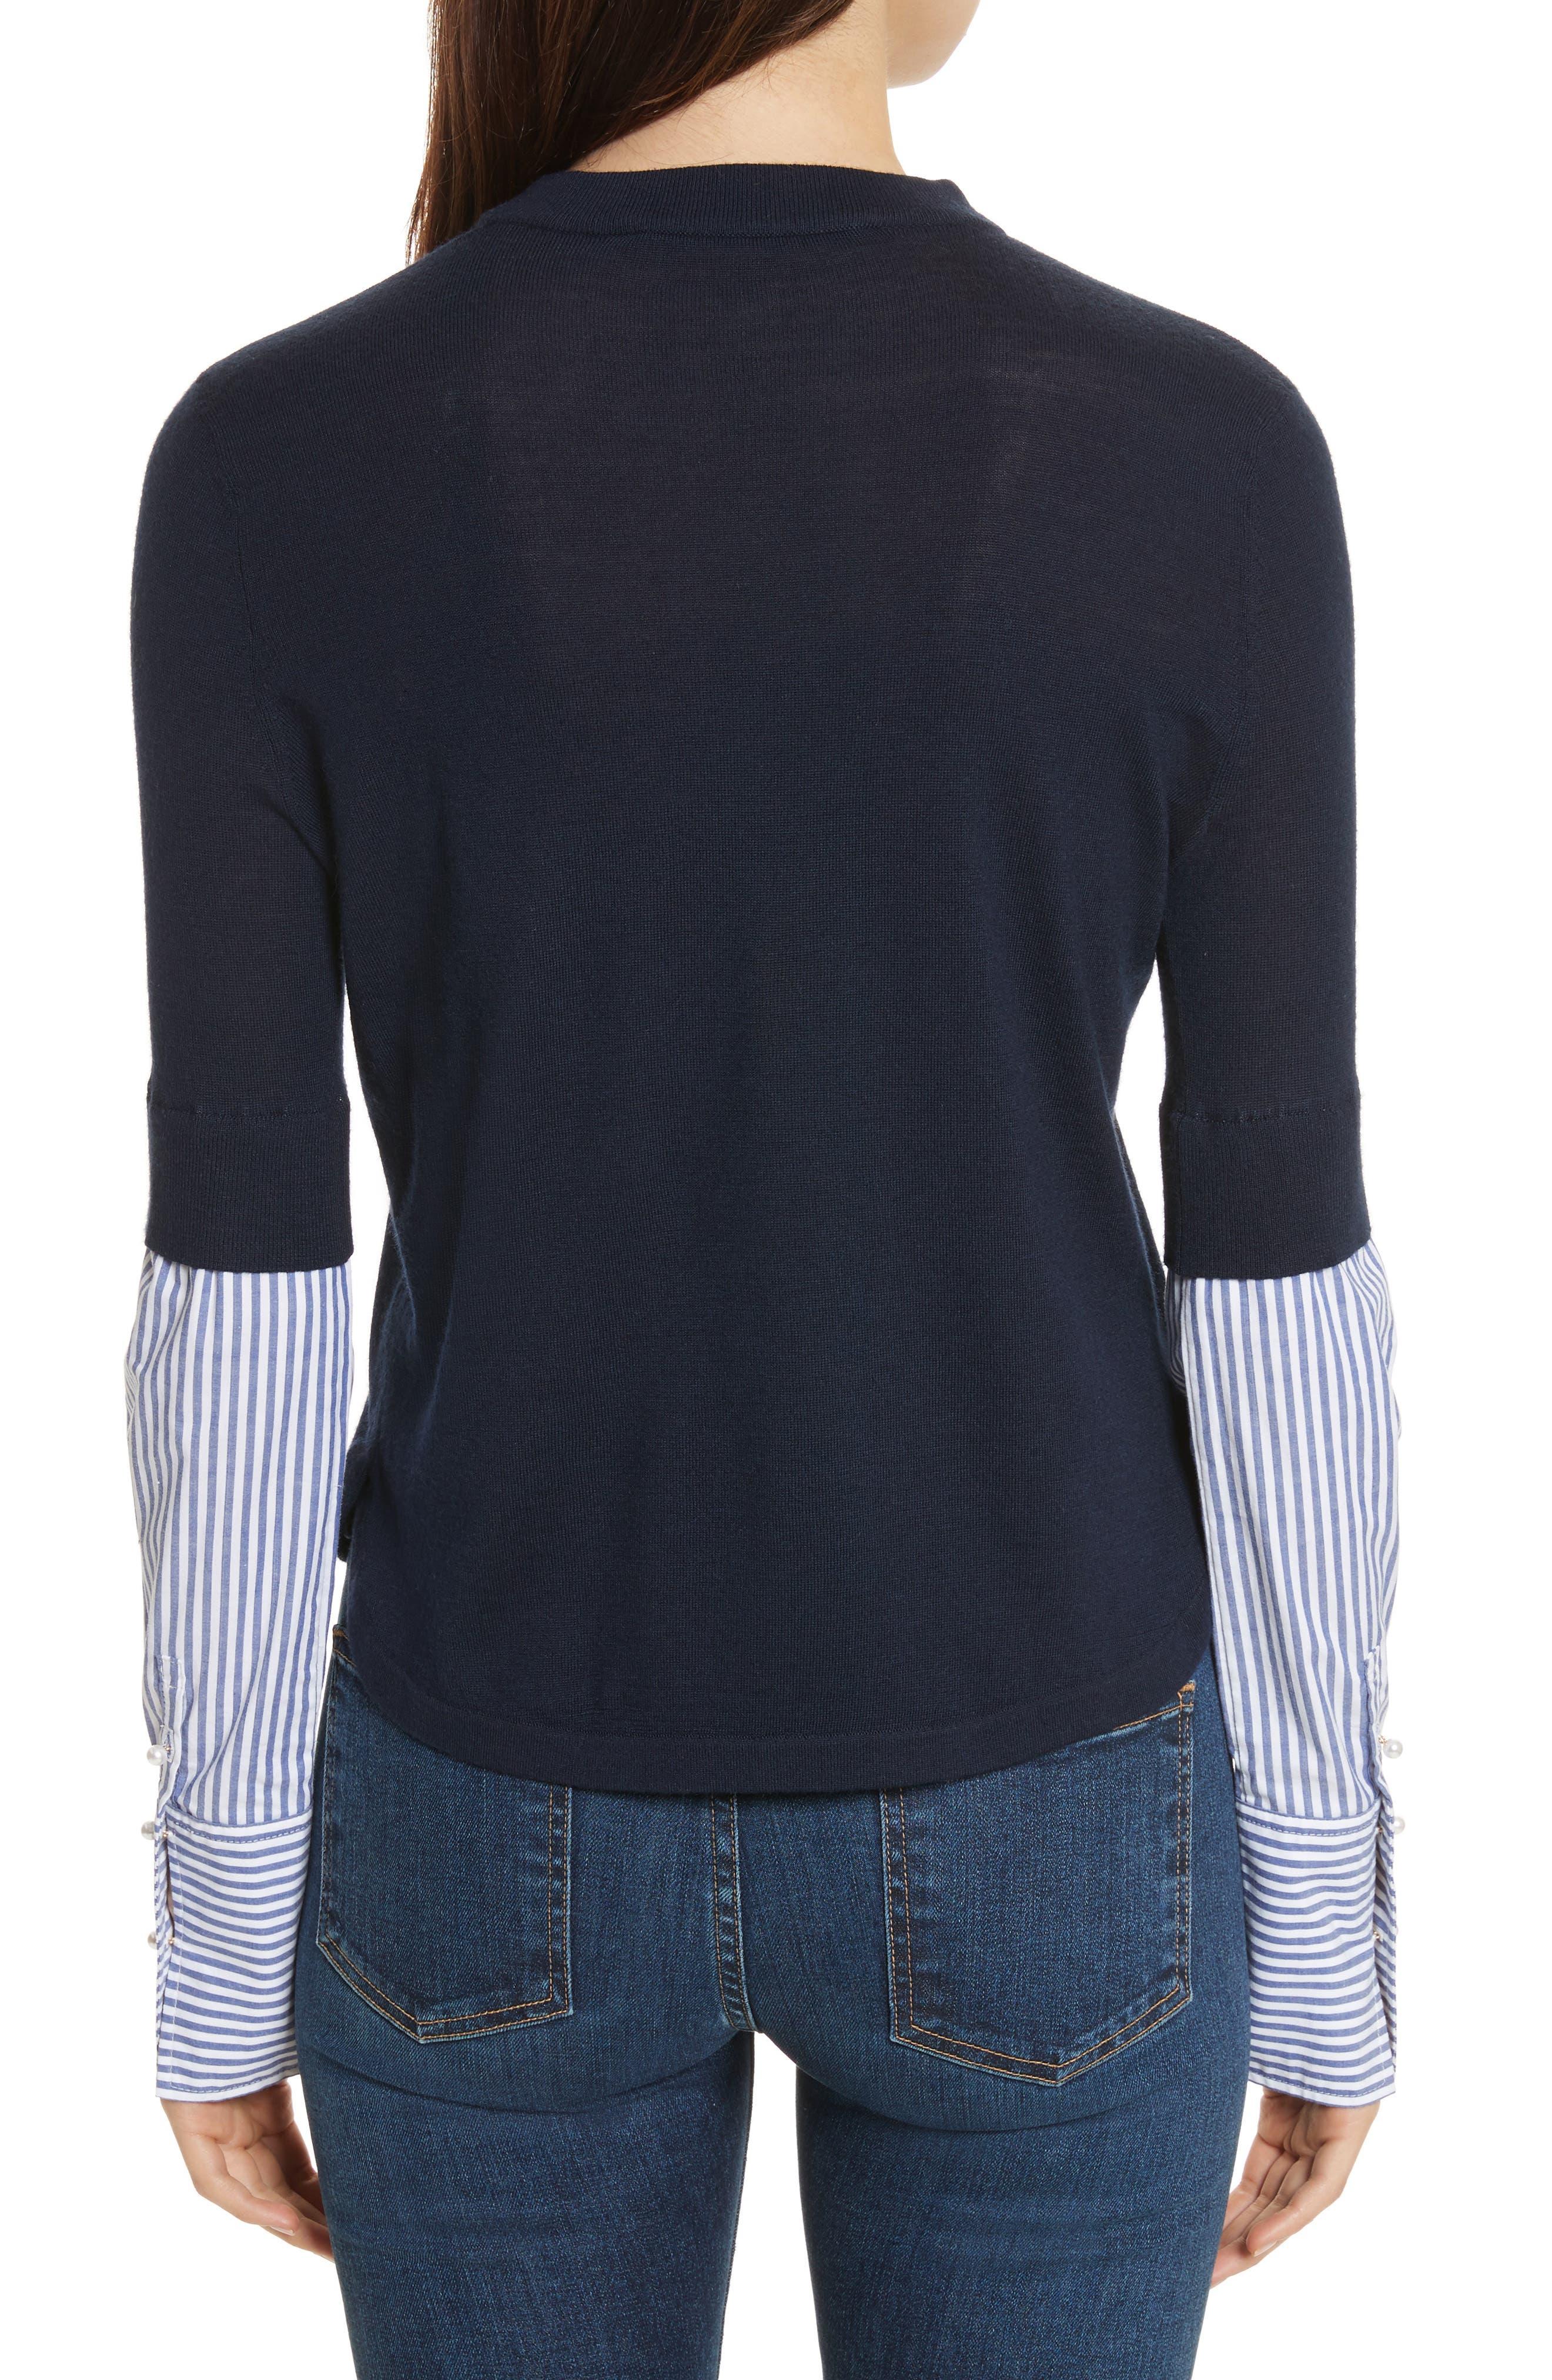 Roscoe Mixed Media Sweater,                             Alternate thumbnail 2, color,                             410